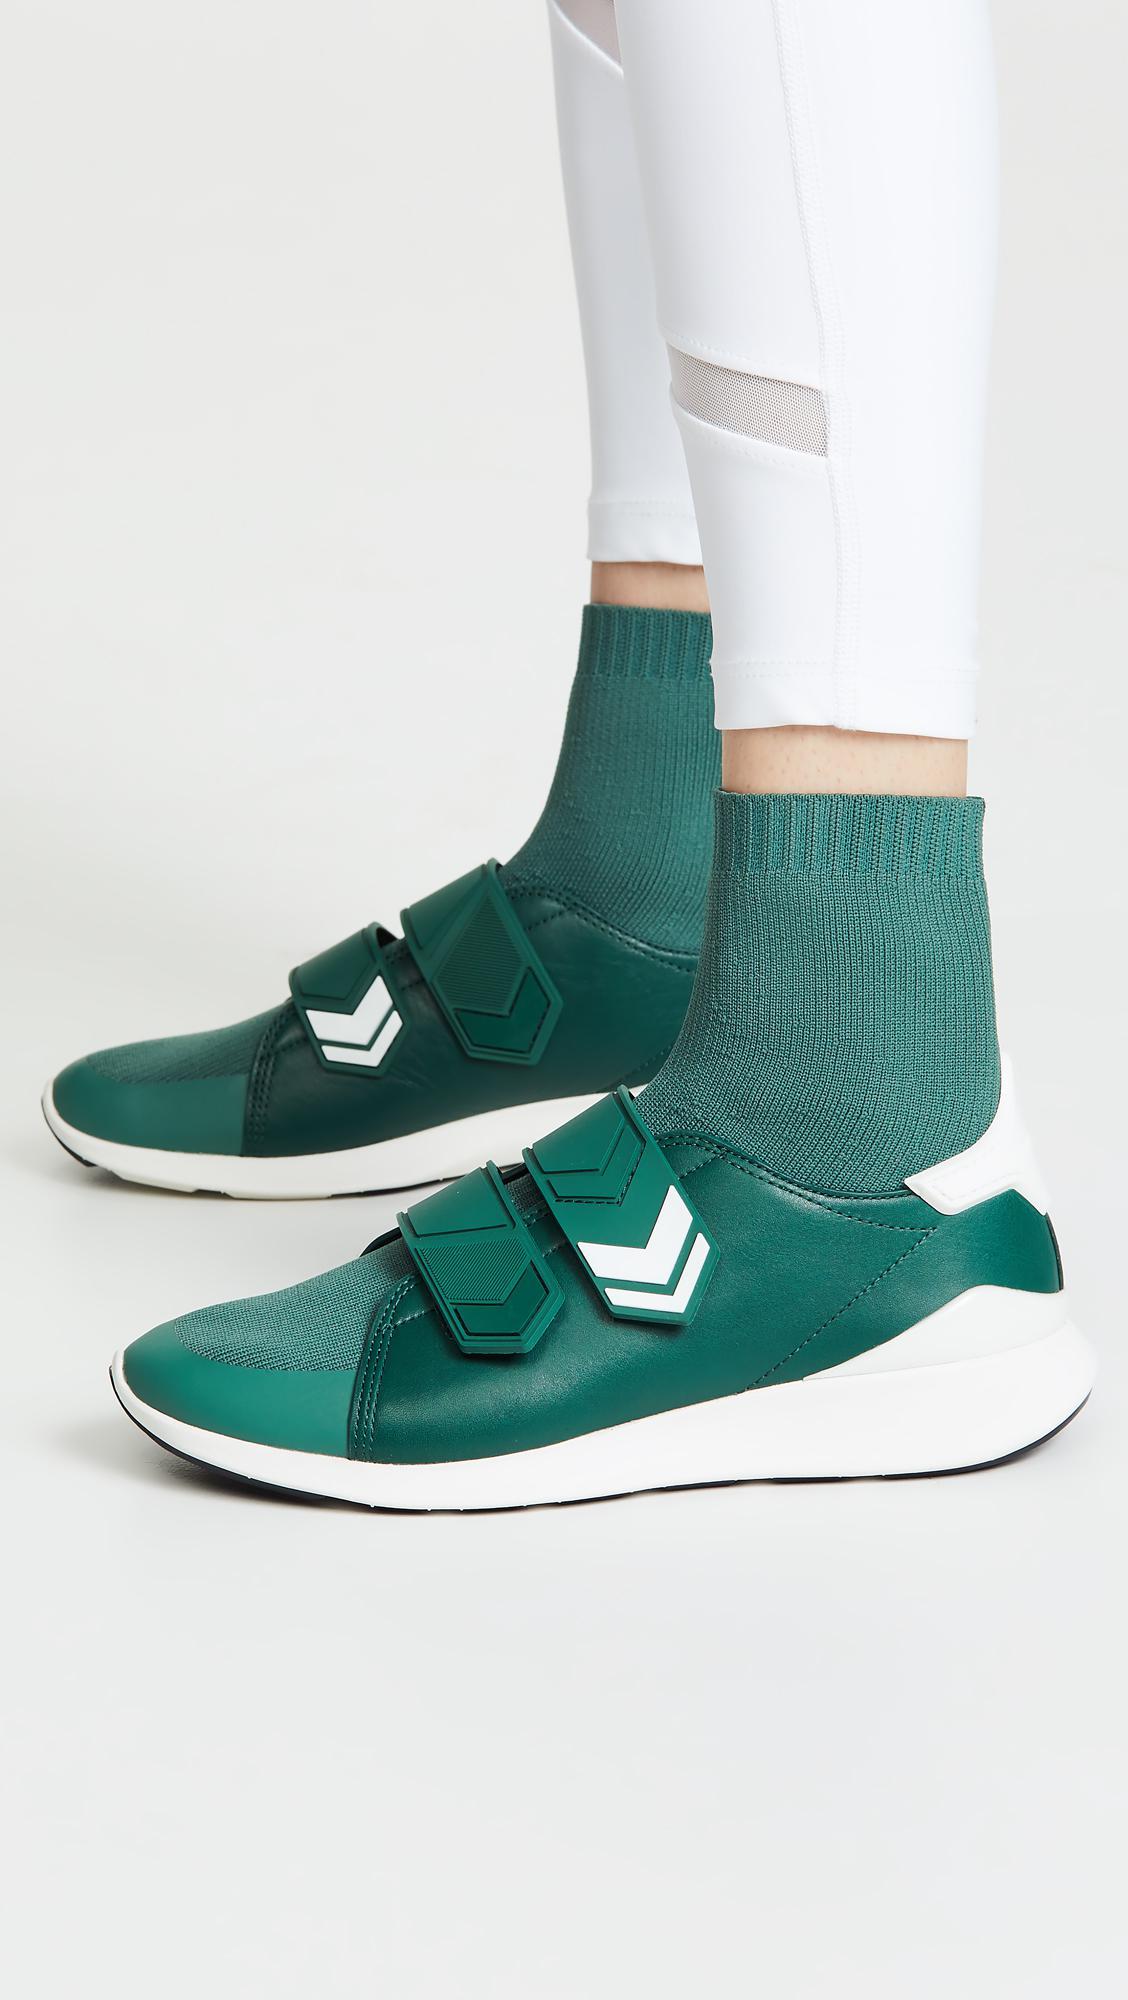 c41c400b86f4 Tory Sport Chevron Strap Sock Sneakers in Green - Lyst